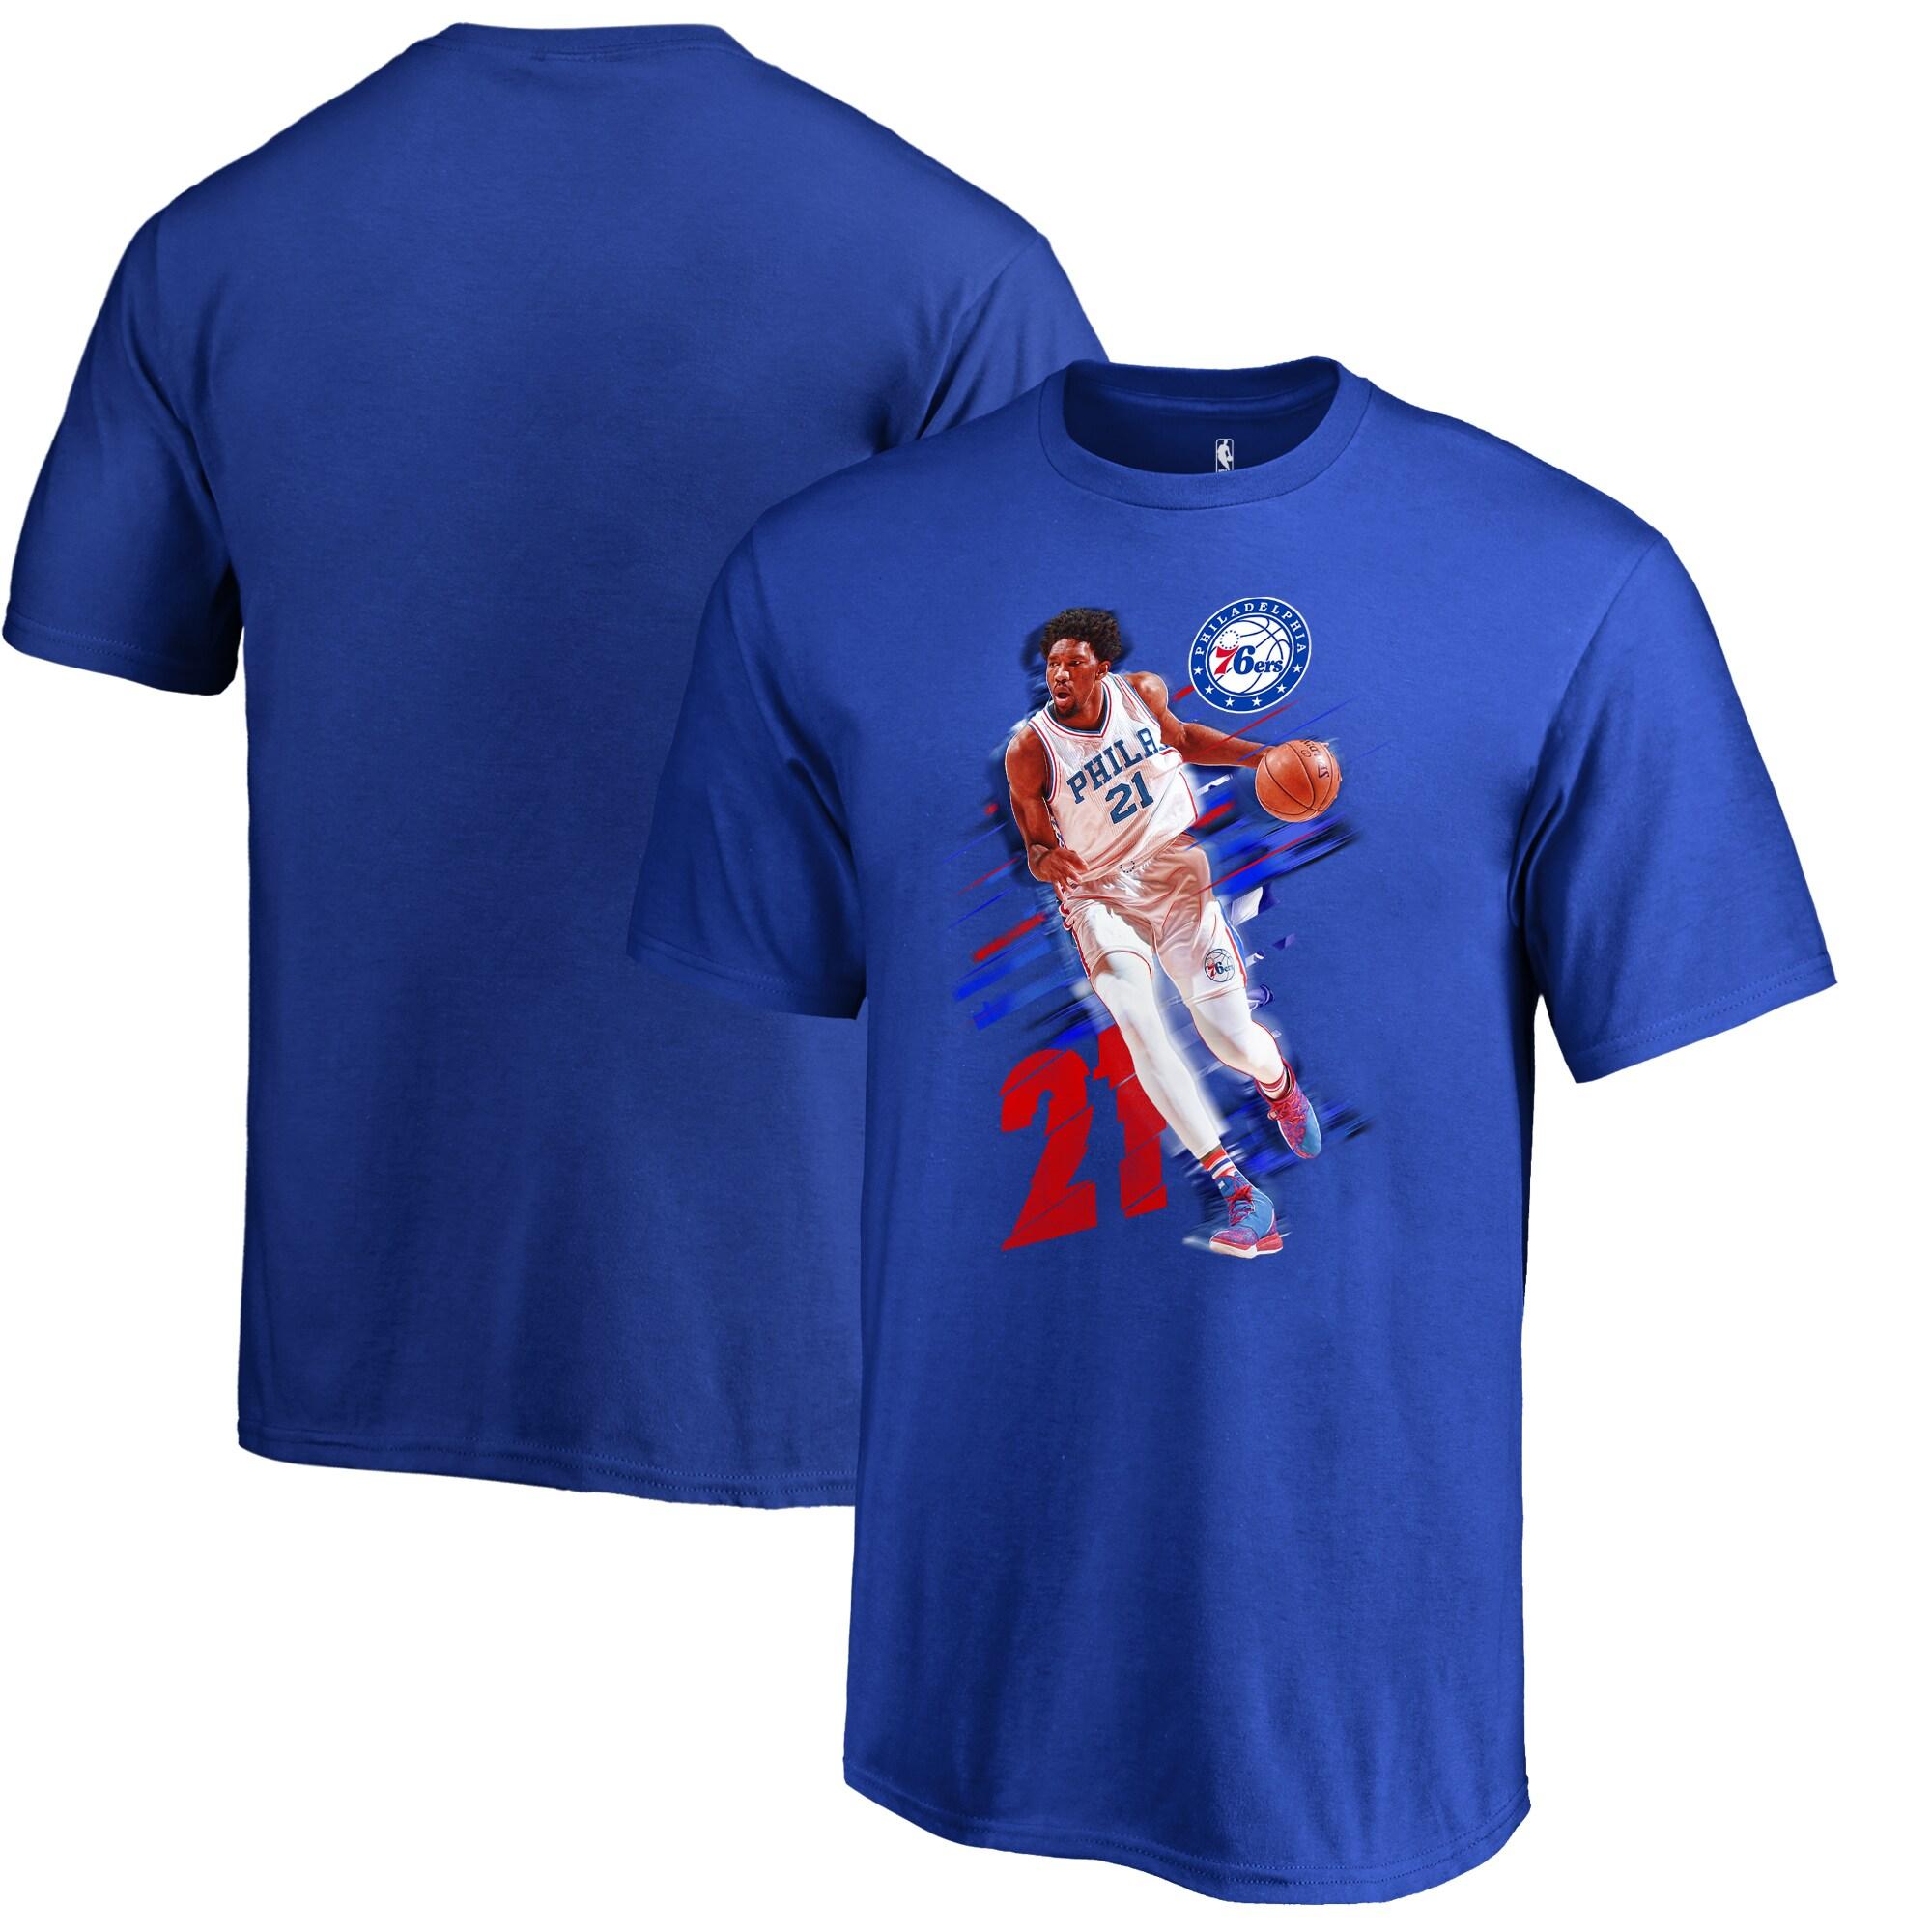 Joel Embiid Philadelphia 76ers Fanatics Branded Youth Fade Away T-Shirt - Royal